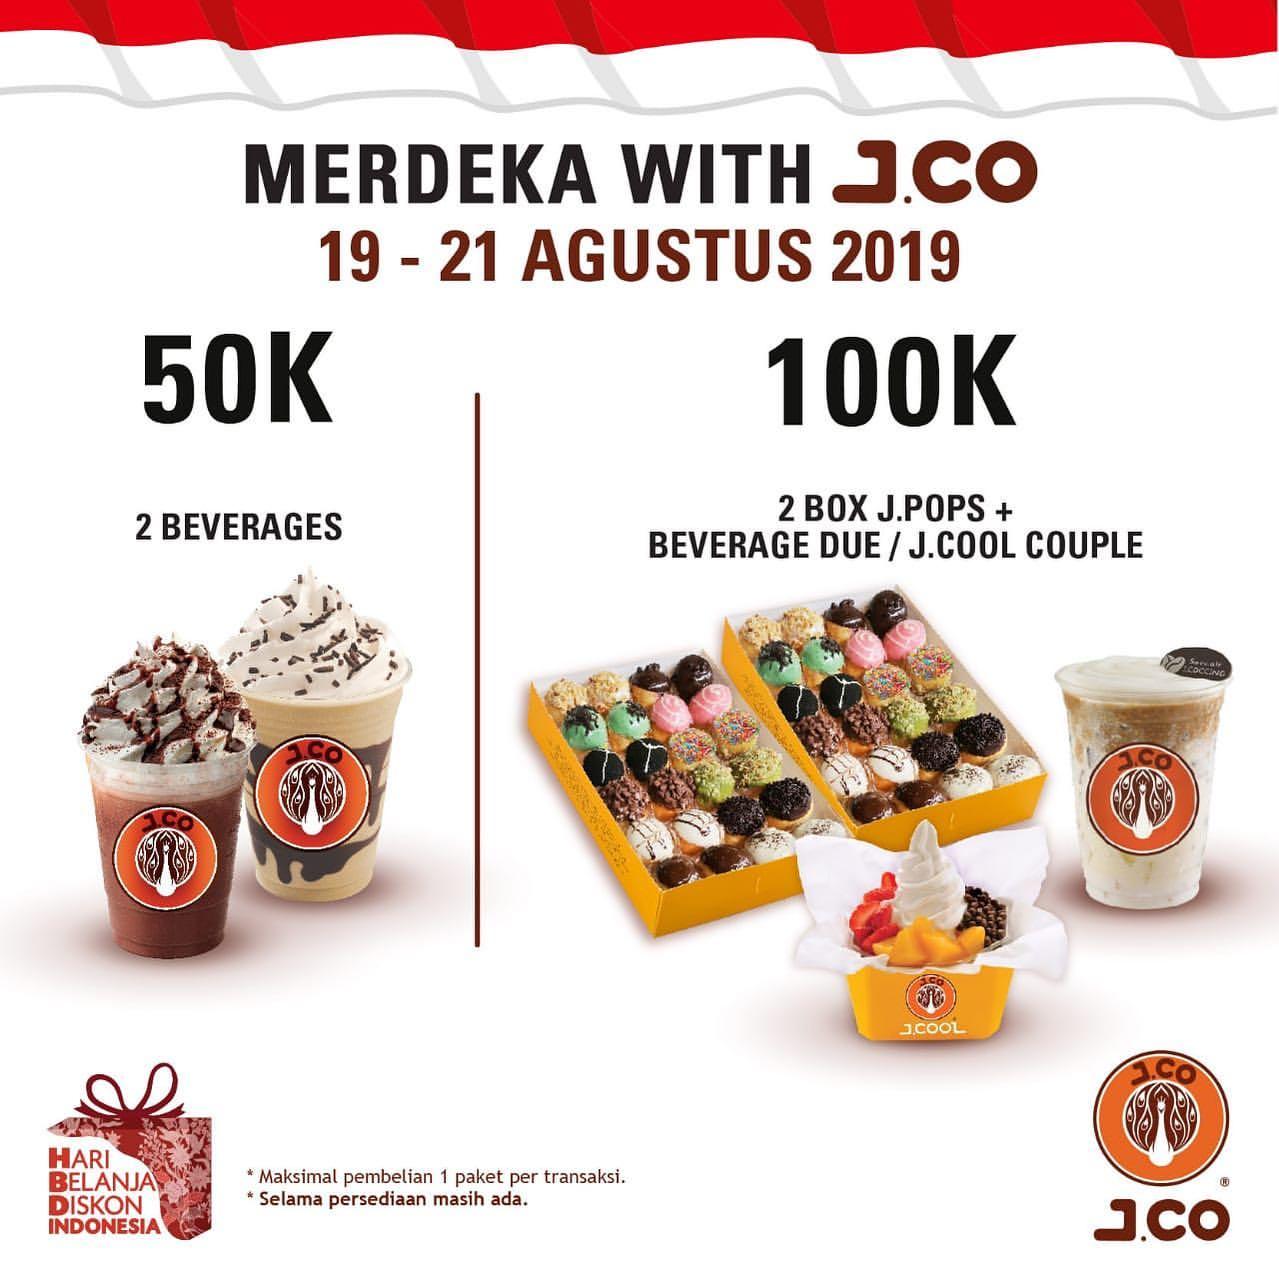 JCO Promo MERDEKA Harga Spesial Hanya Rp.100.000